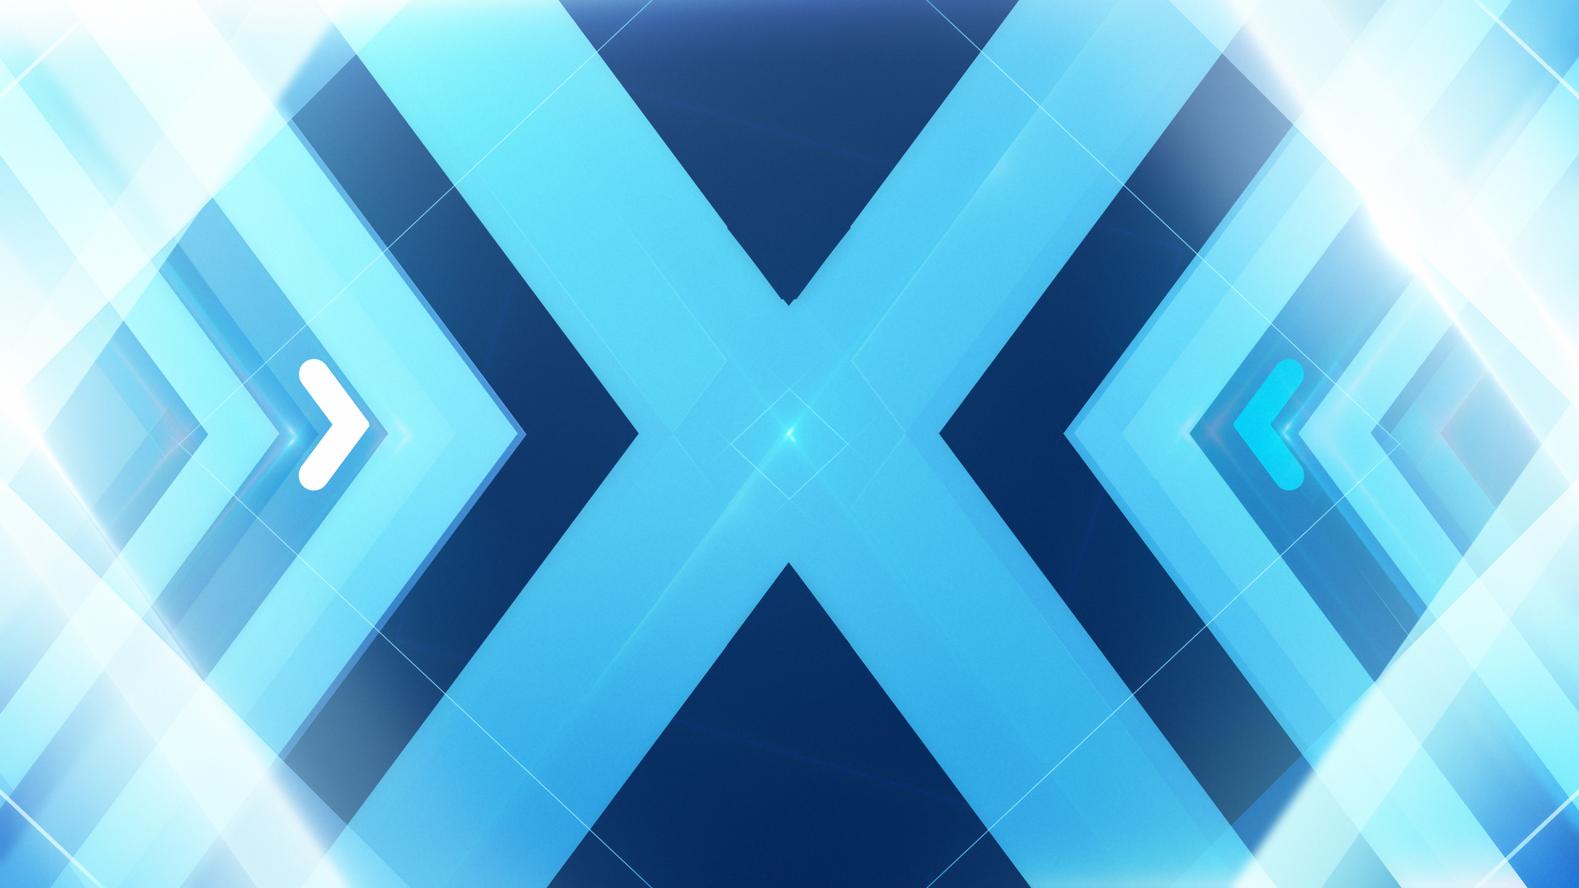 mixer_kaliede_v2.0408.png